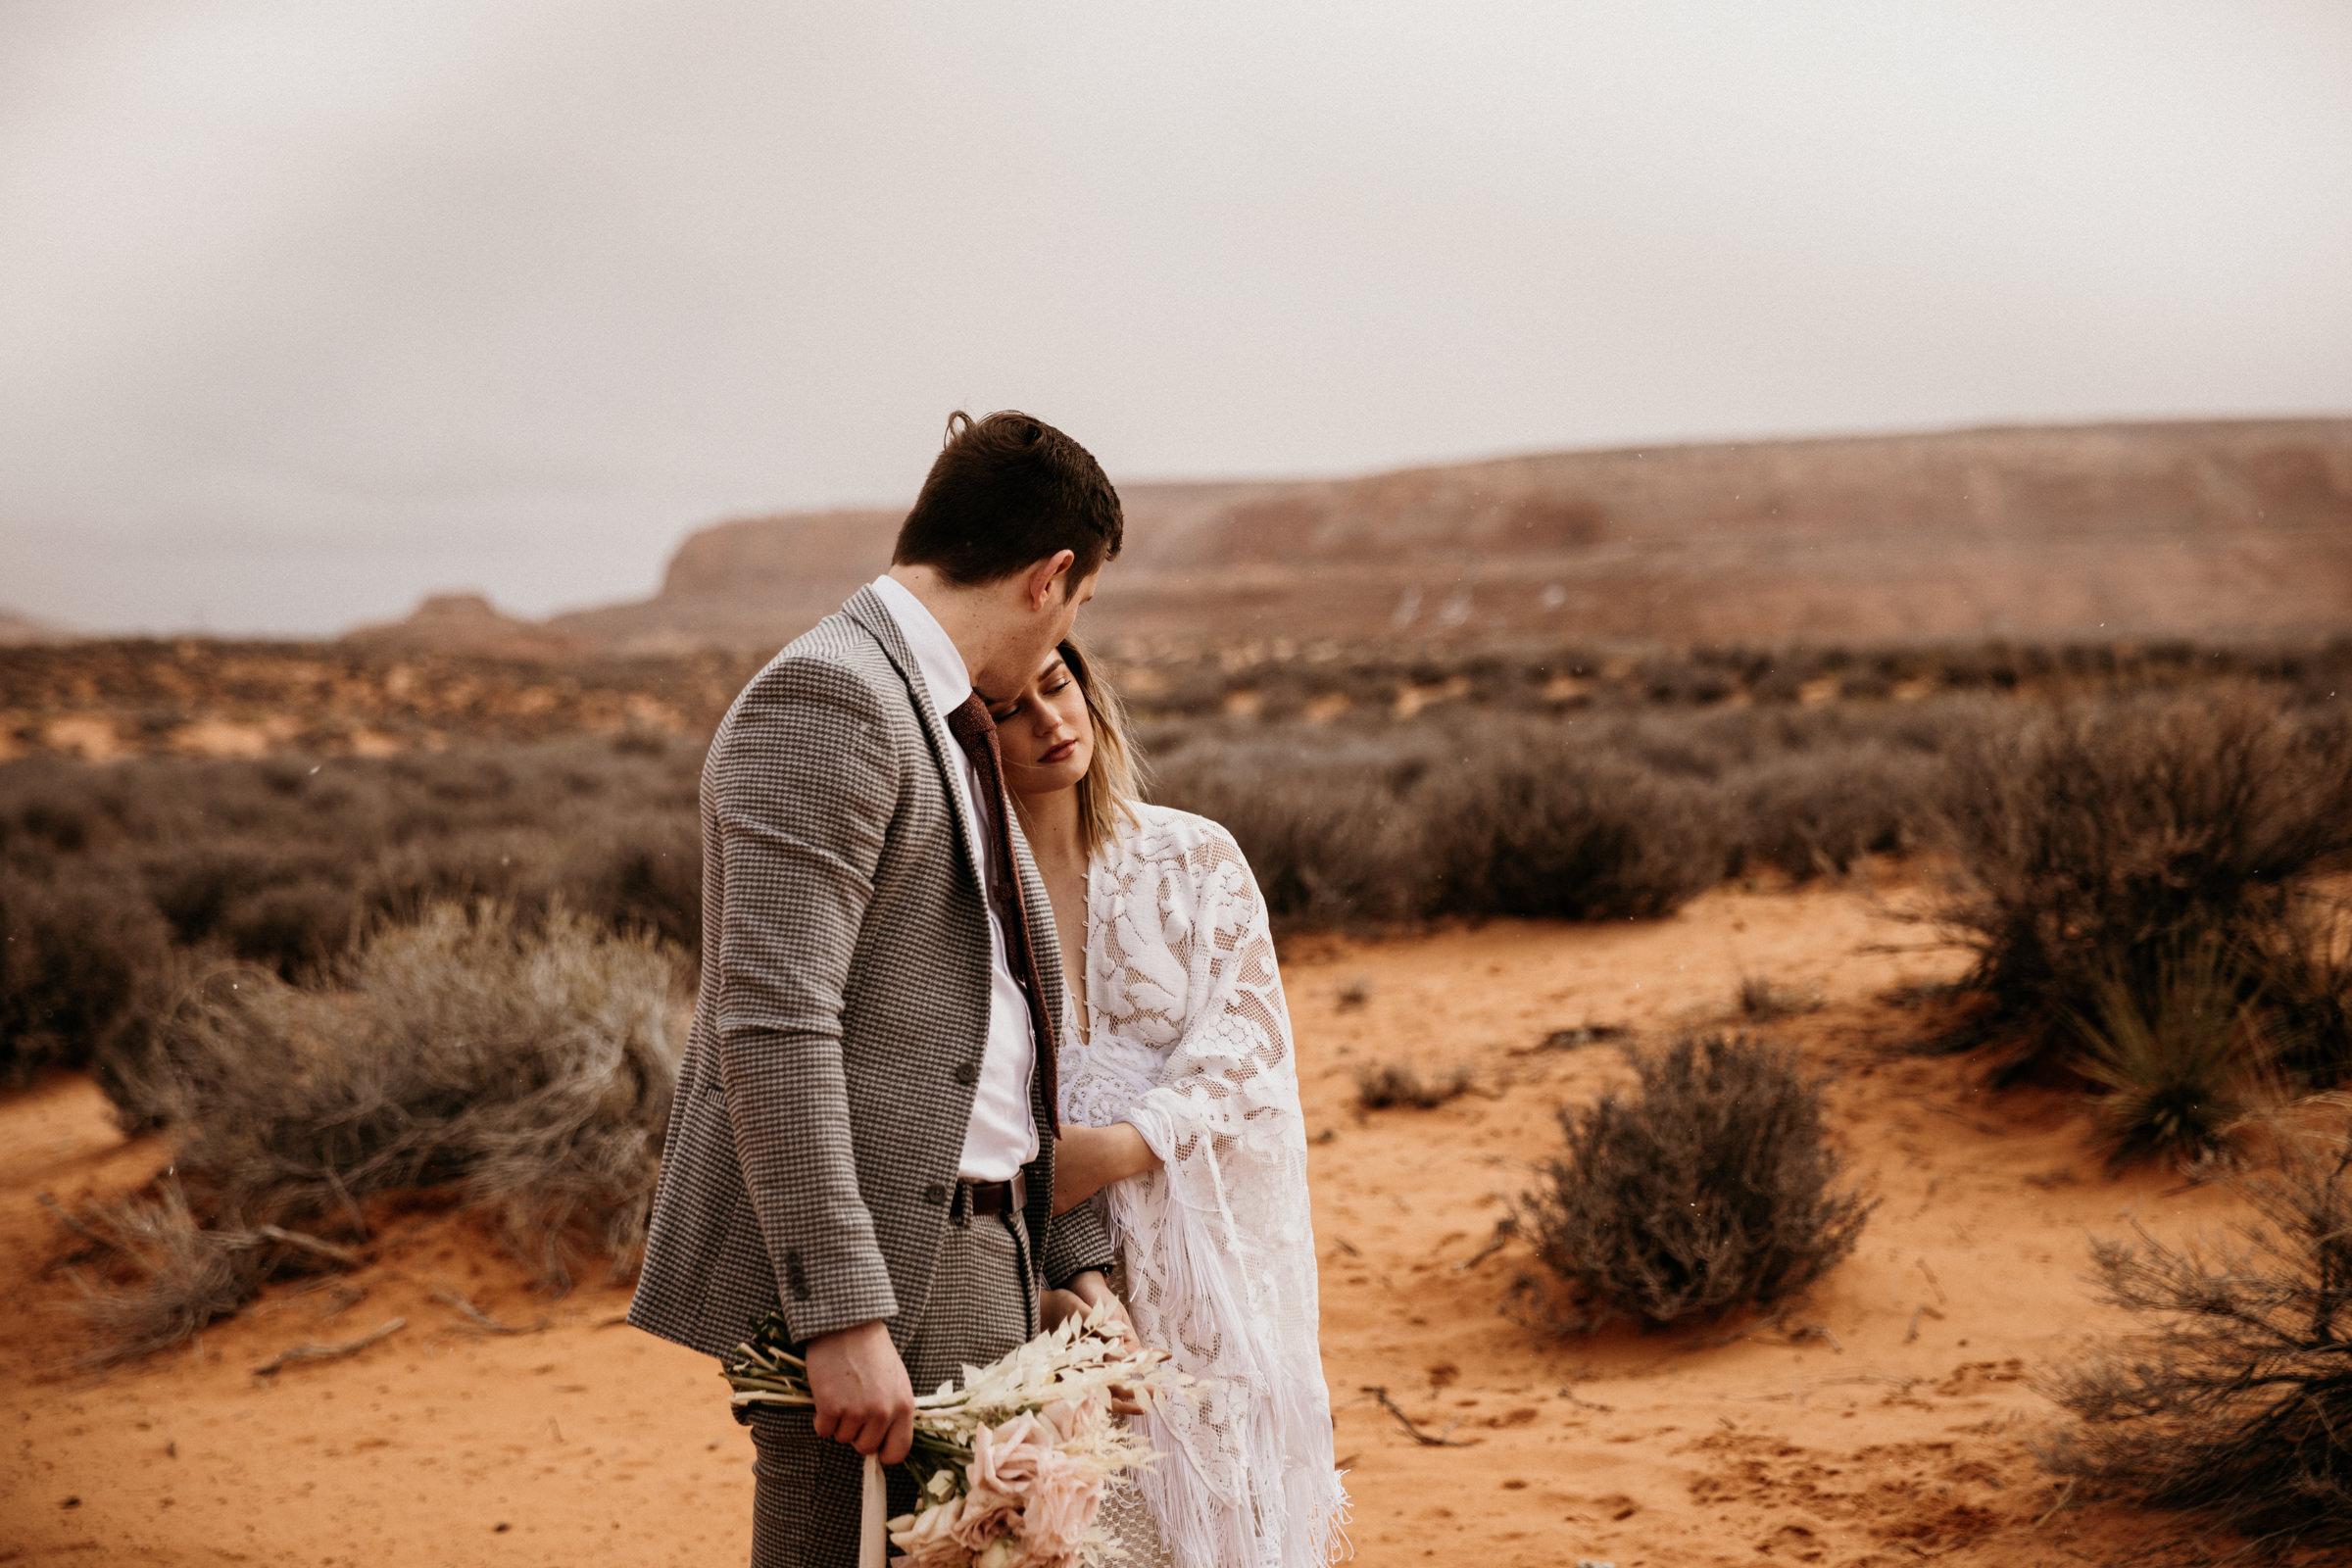 high-end-adventure-wedding-photography-in-arizona.jpg